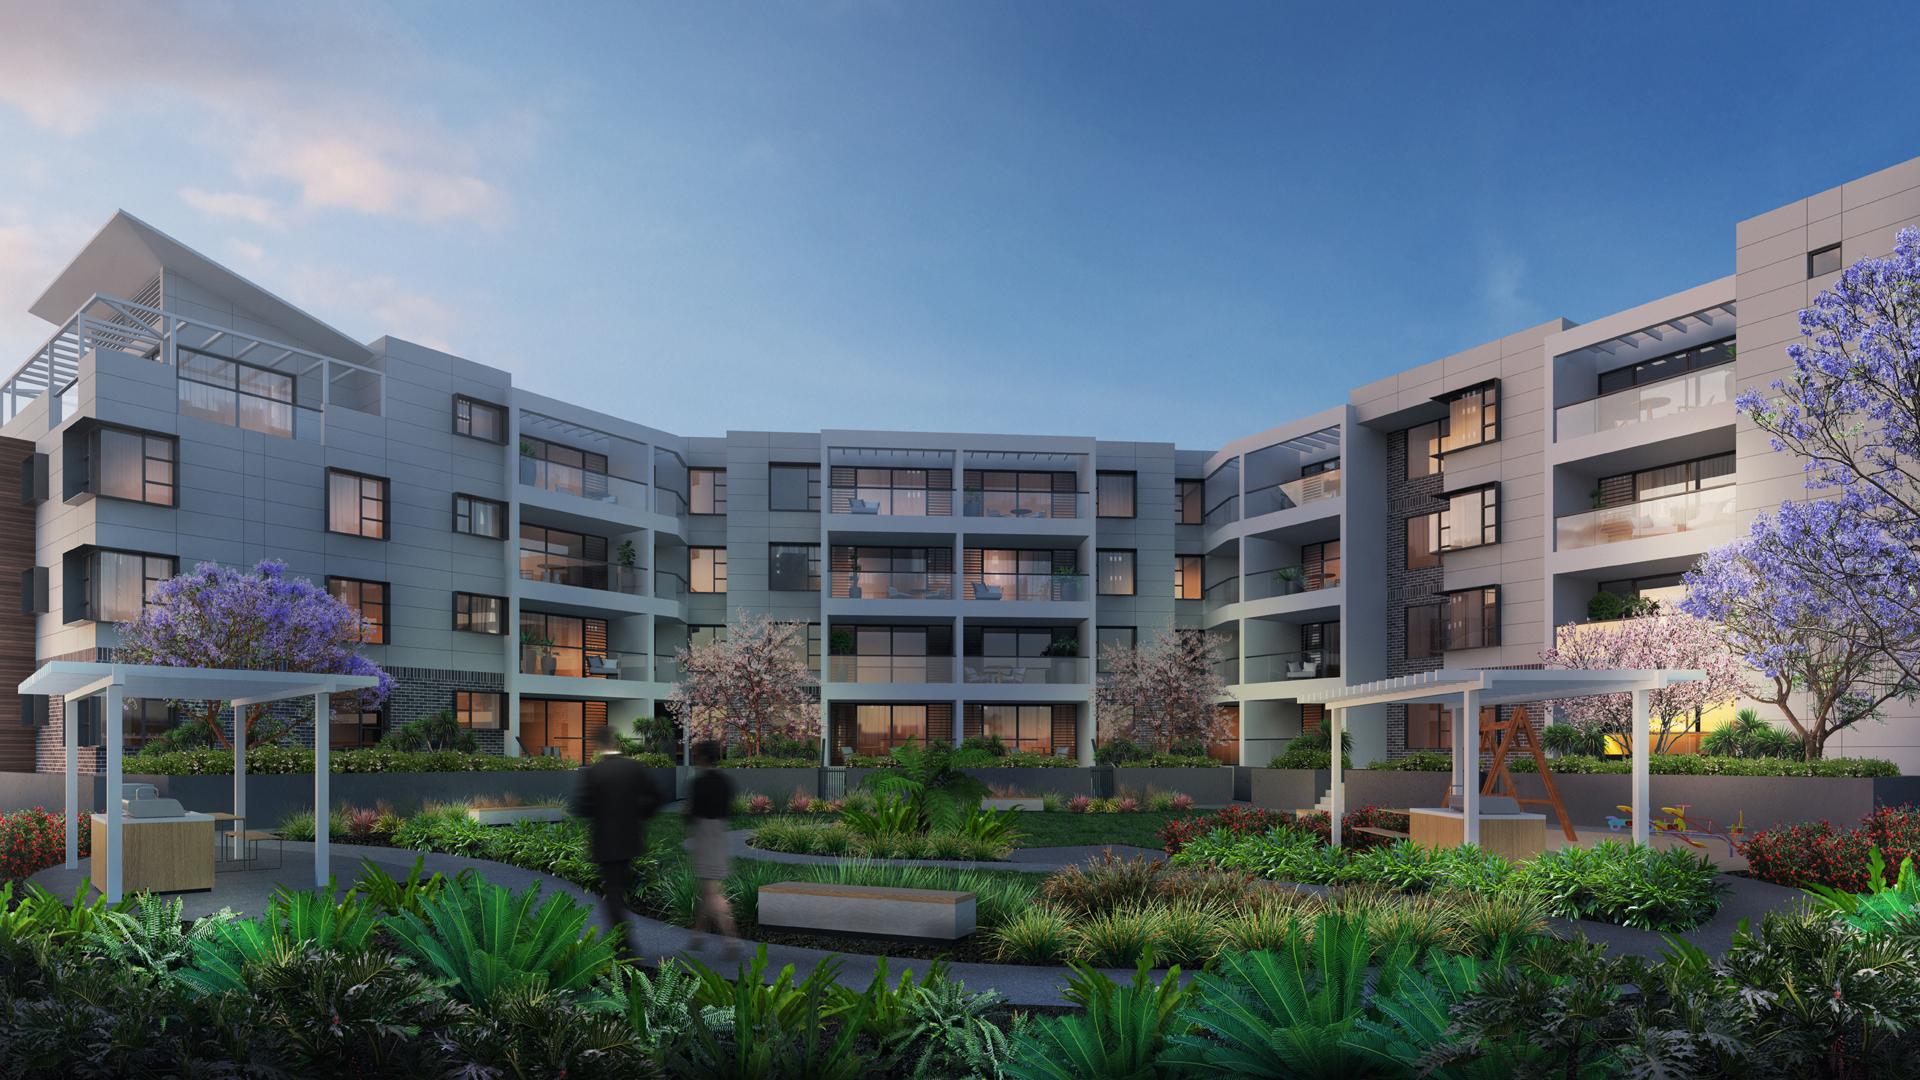 Rockdale Garden Apartments